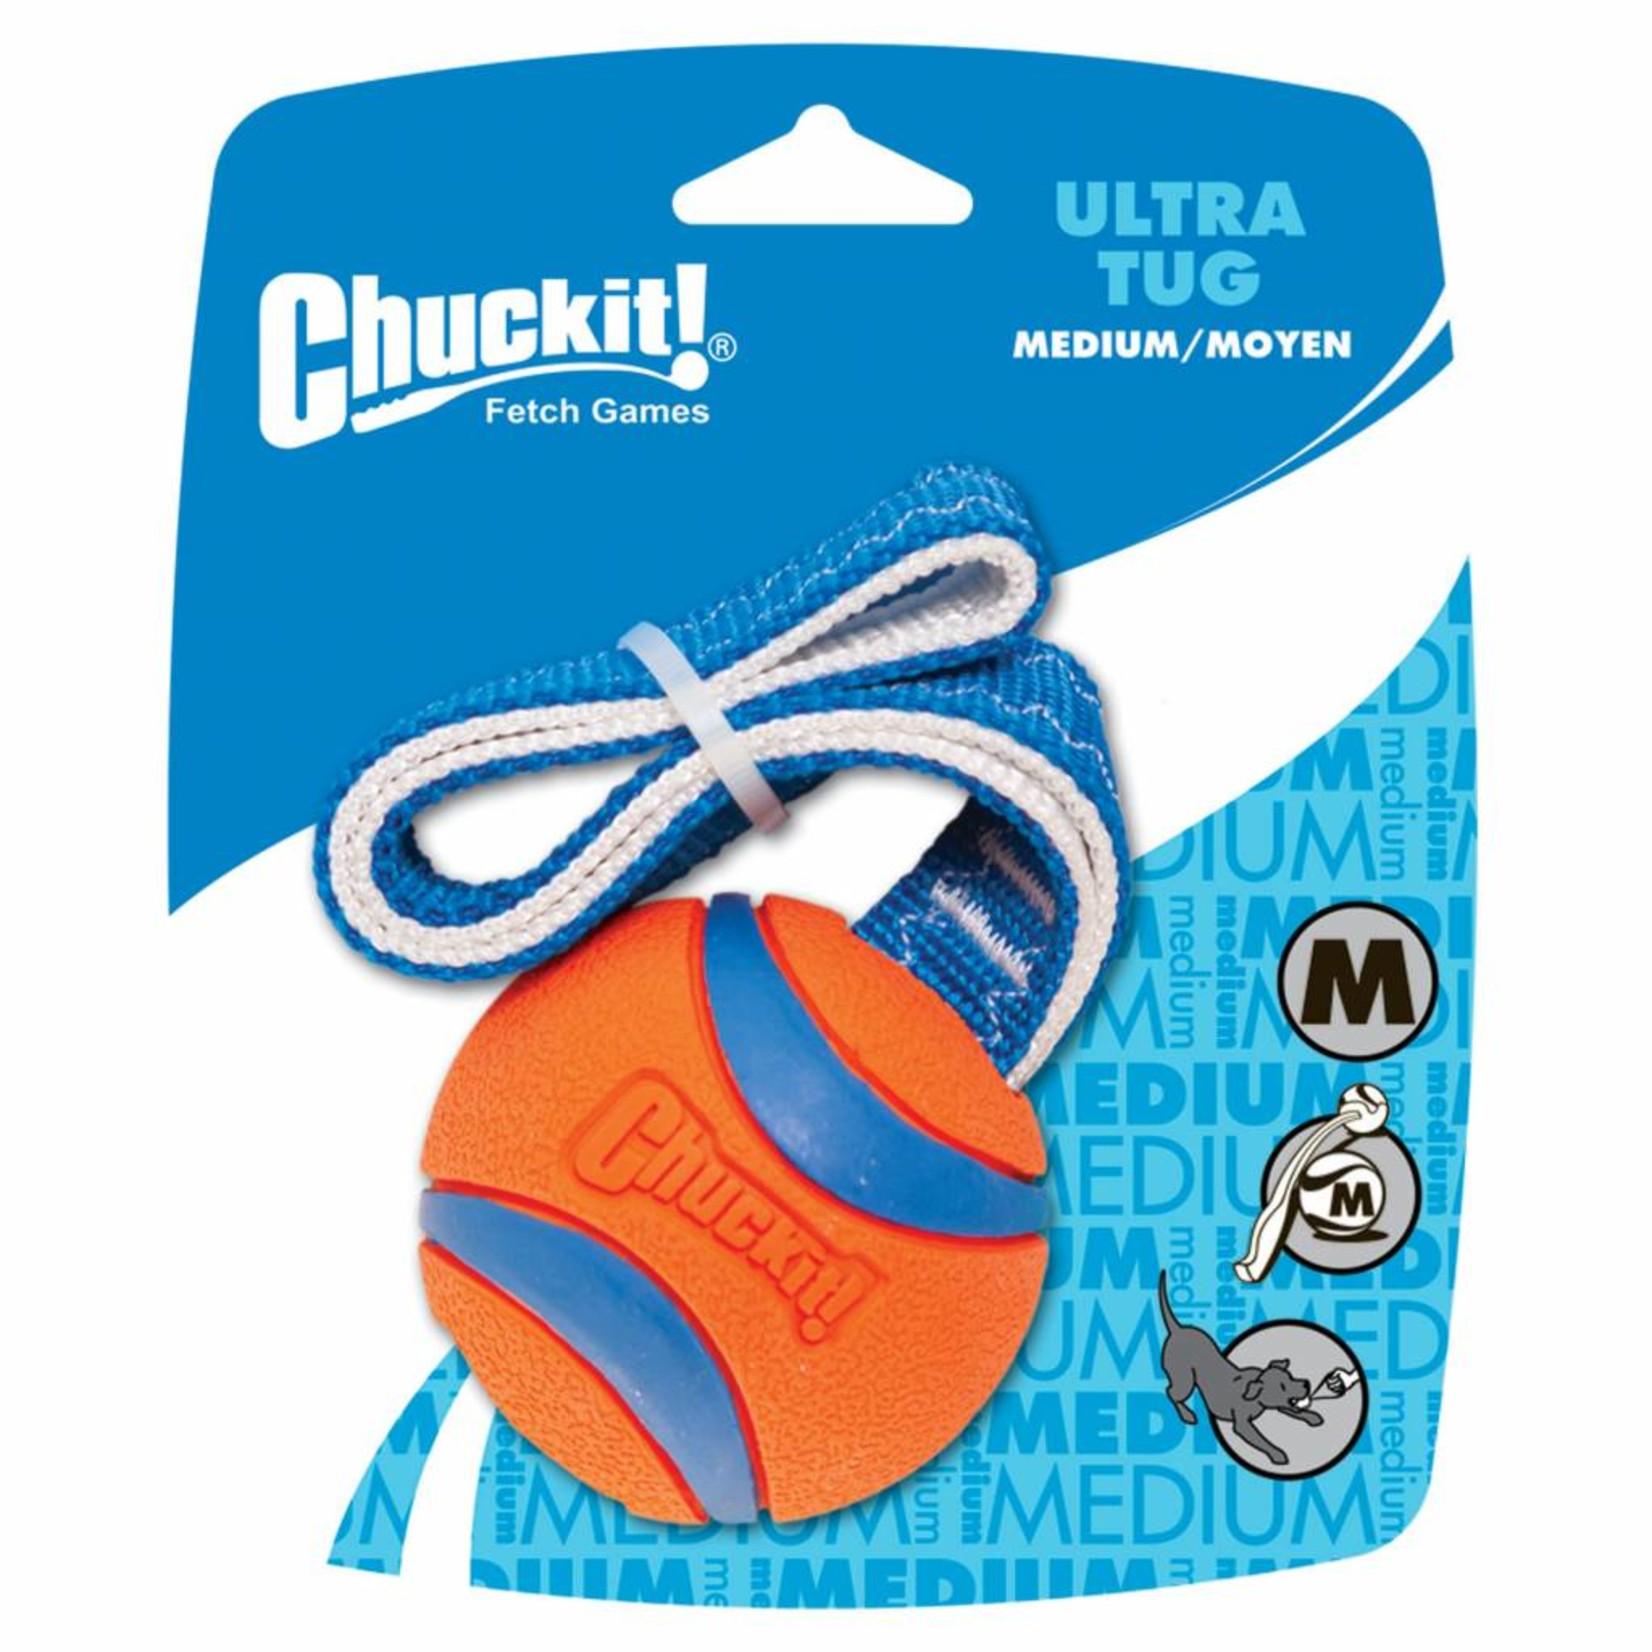 Chuckit! Ultra Tug Dog Toy, Medium 6.5cm